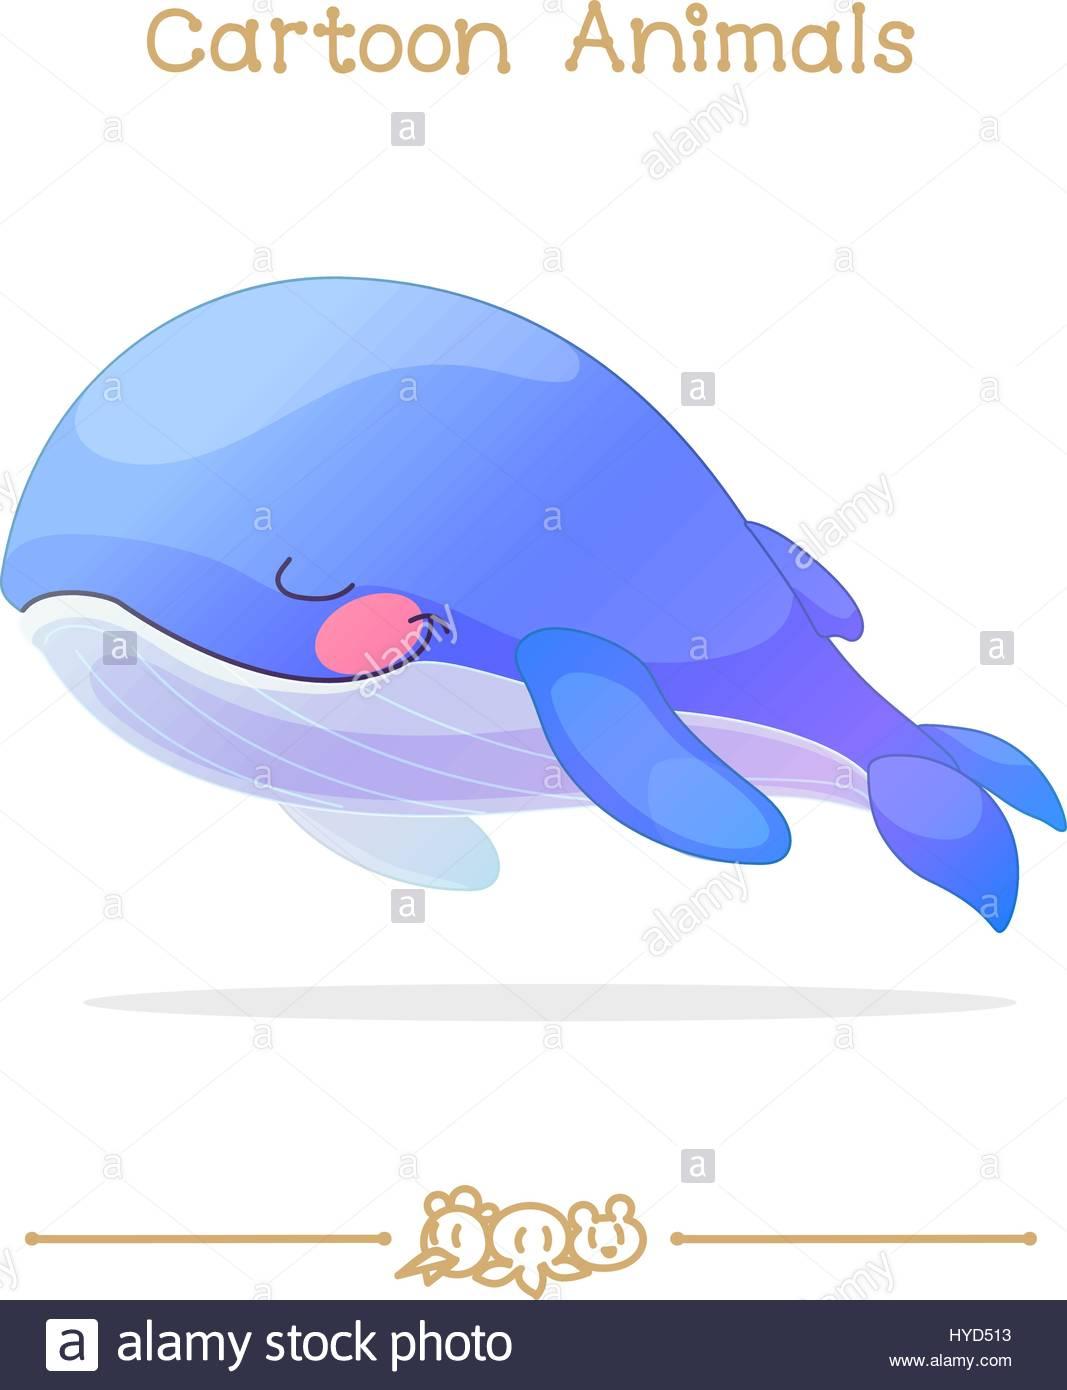 toons series cartoon animals sleeping blue whale stock vector art